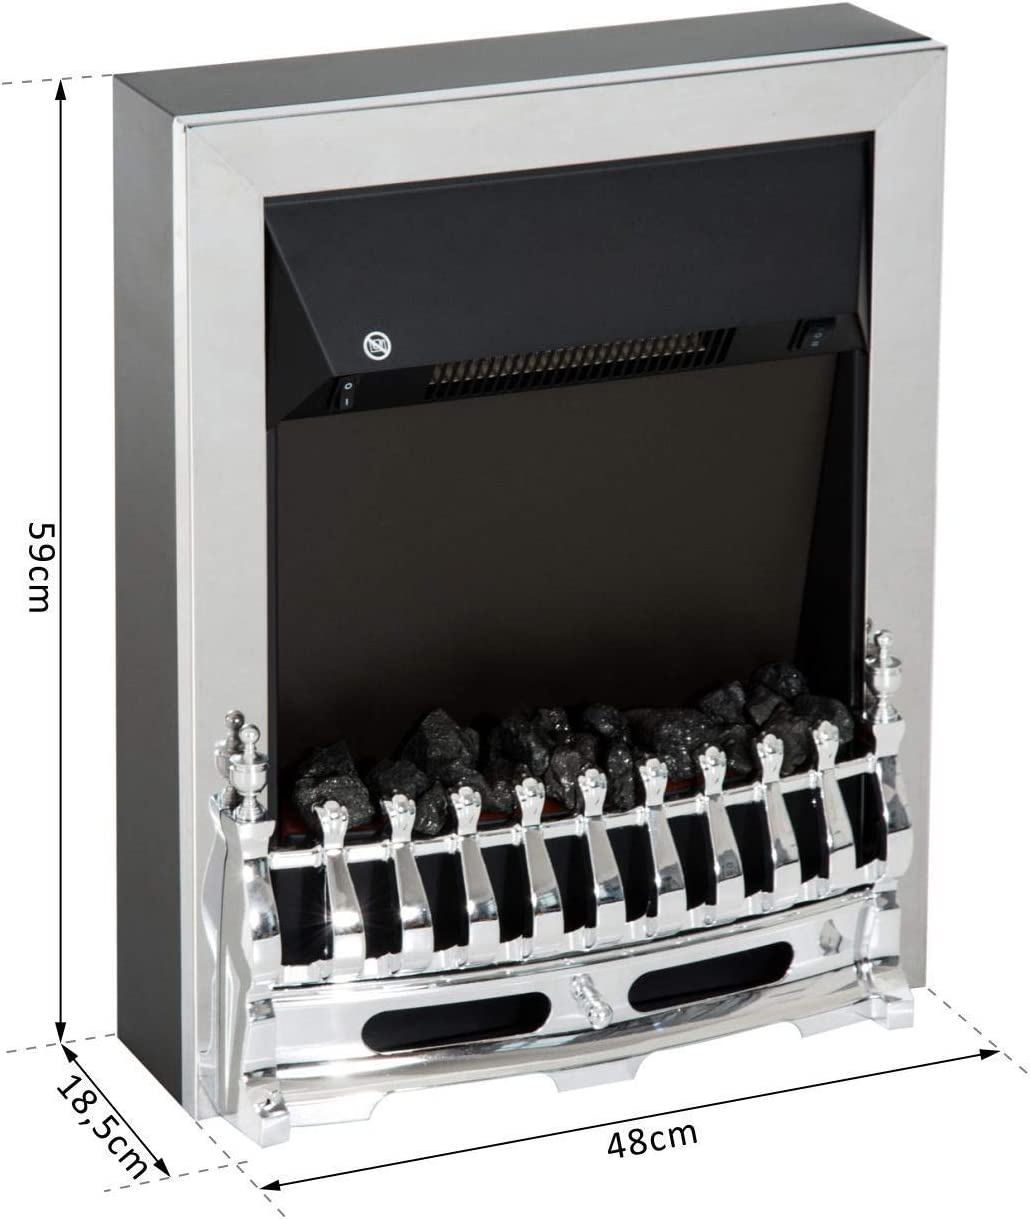 HOMCOM Elektrokamin Kaminofen 2000W Elektrischer Kamin Wandkamin Flammeneffekt Silber